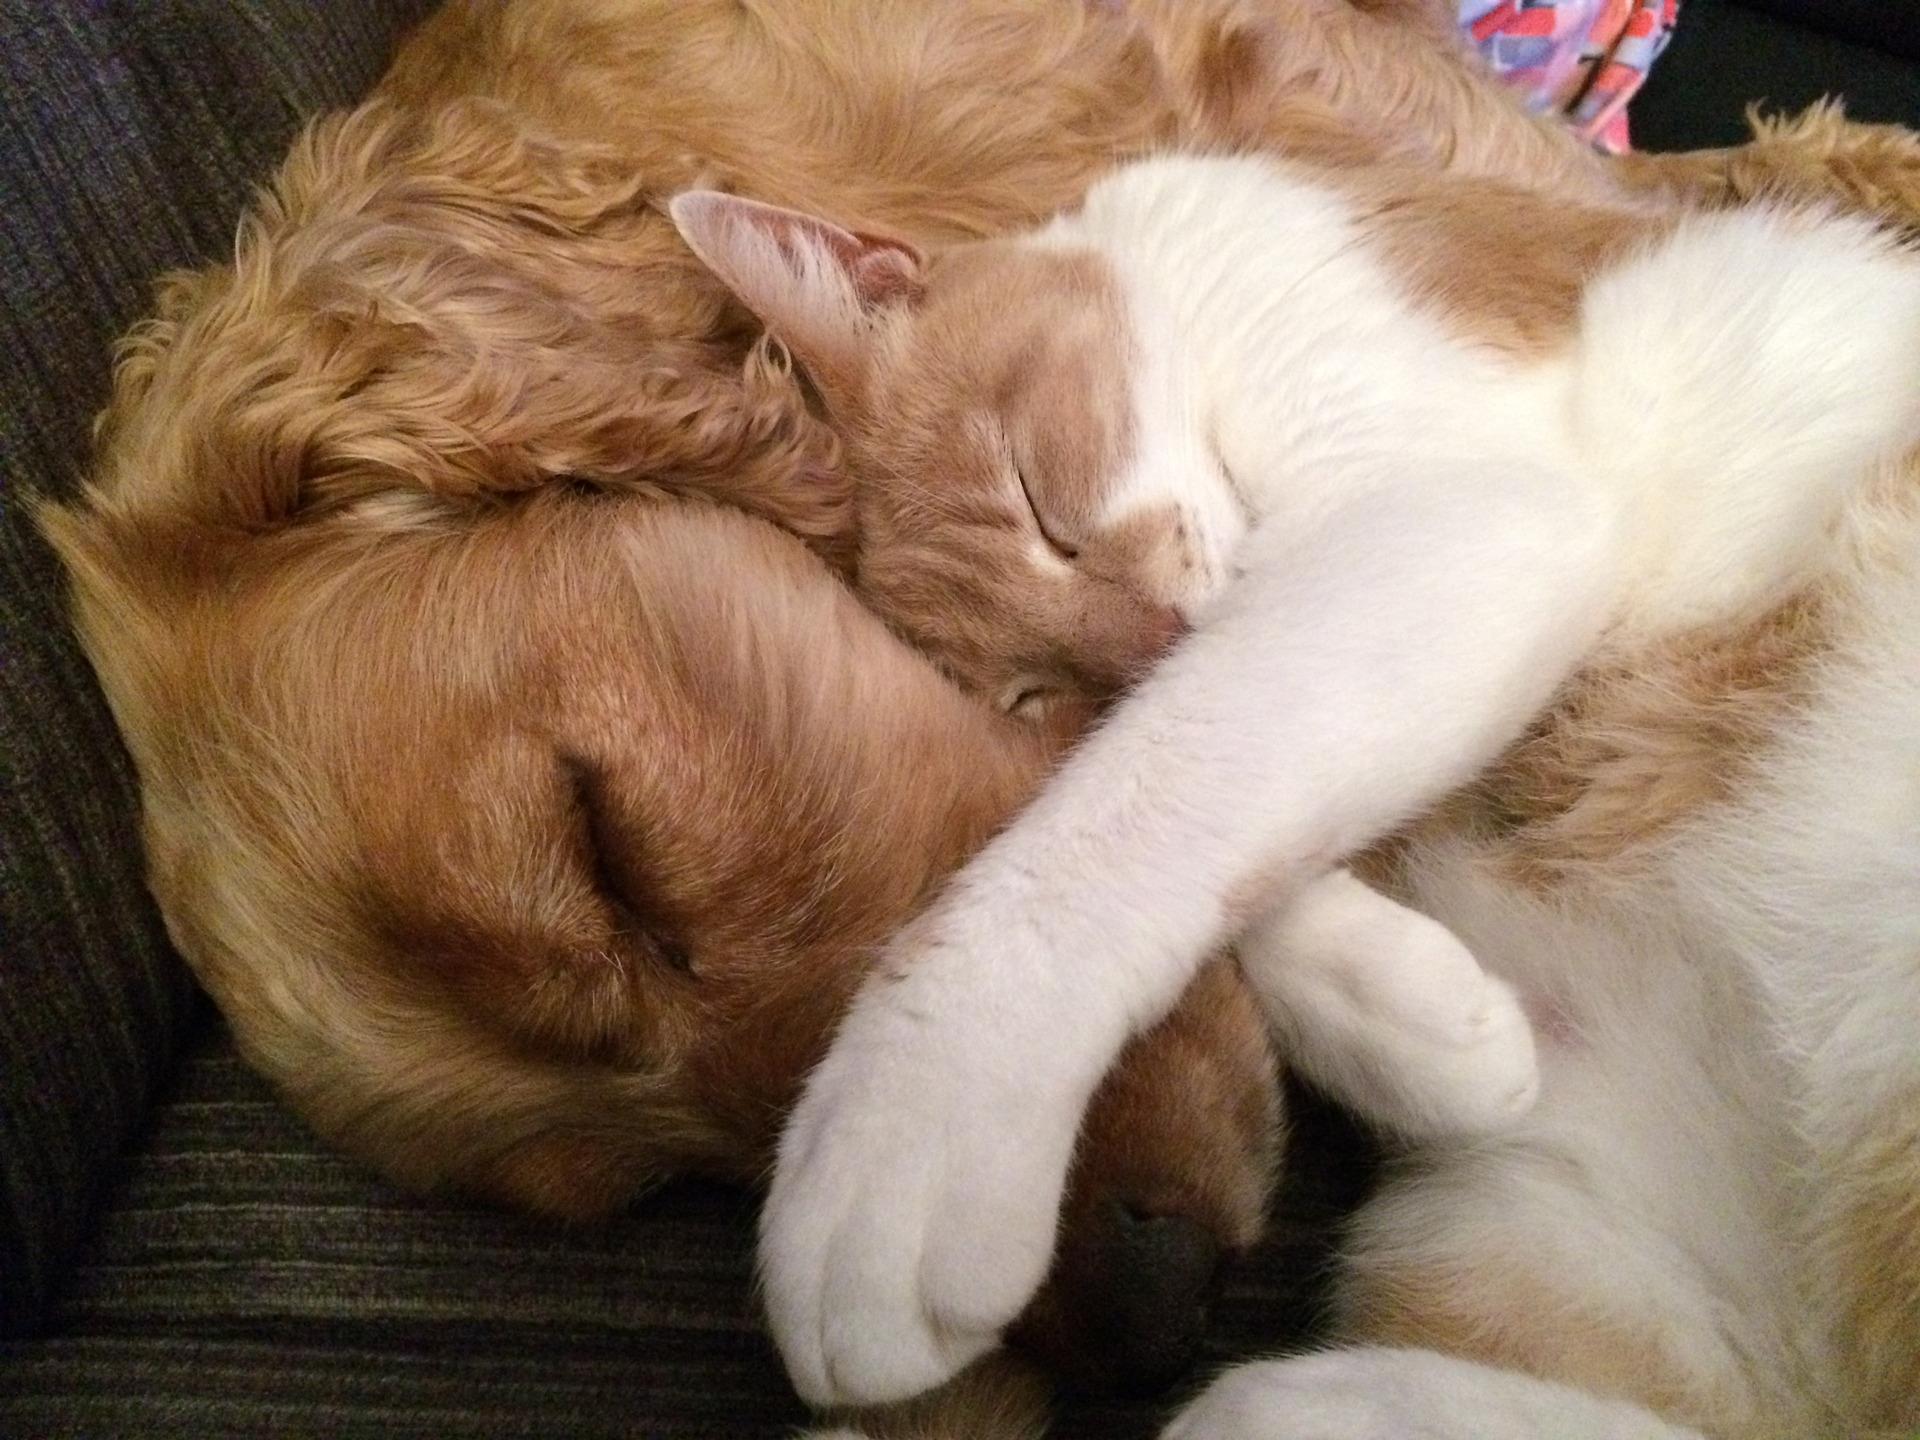 Cachorro e gato Foto Pixabay